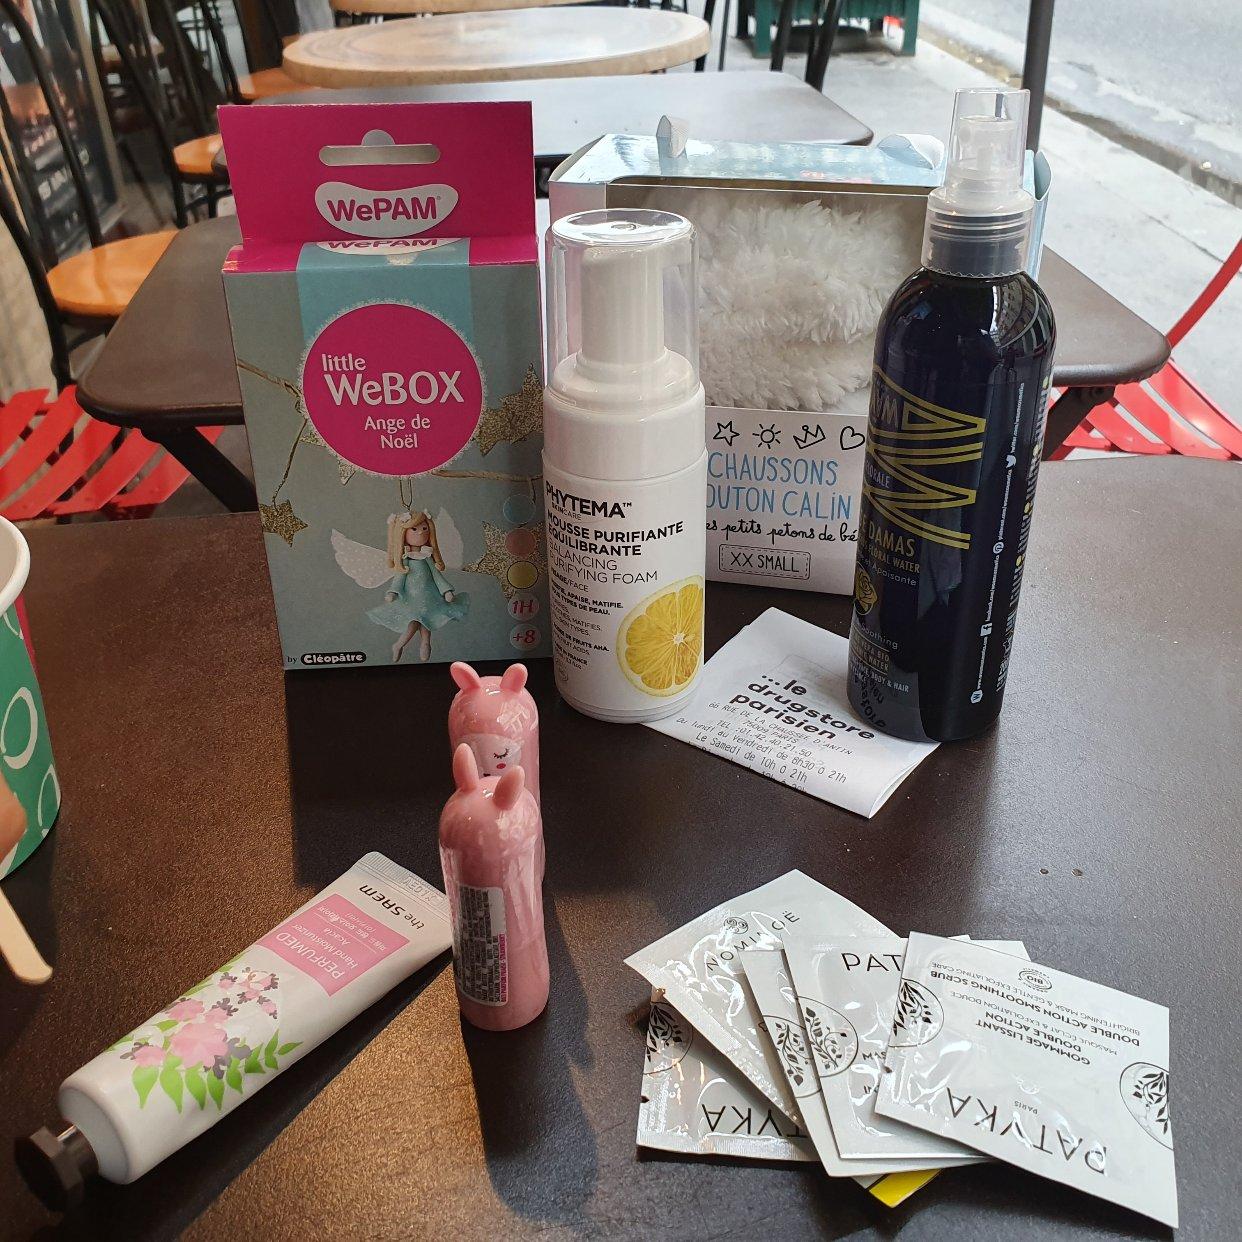 [探店打卡] Drugstore Parisien